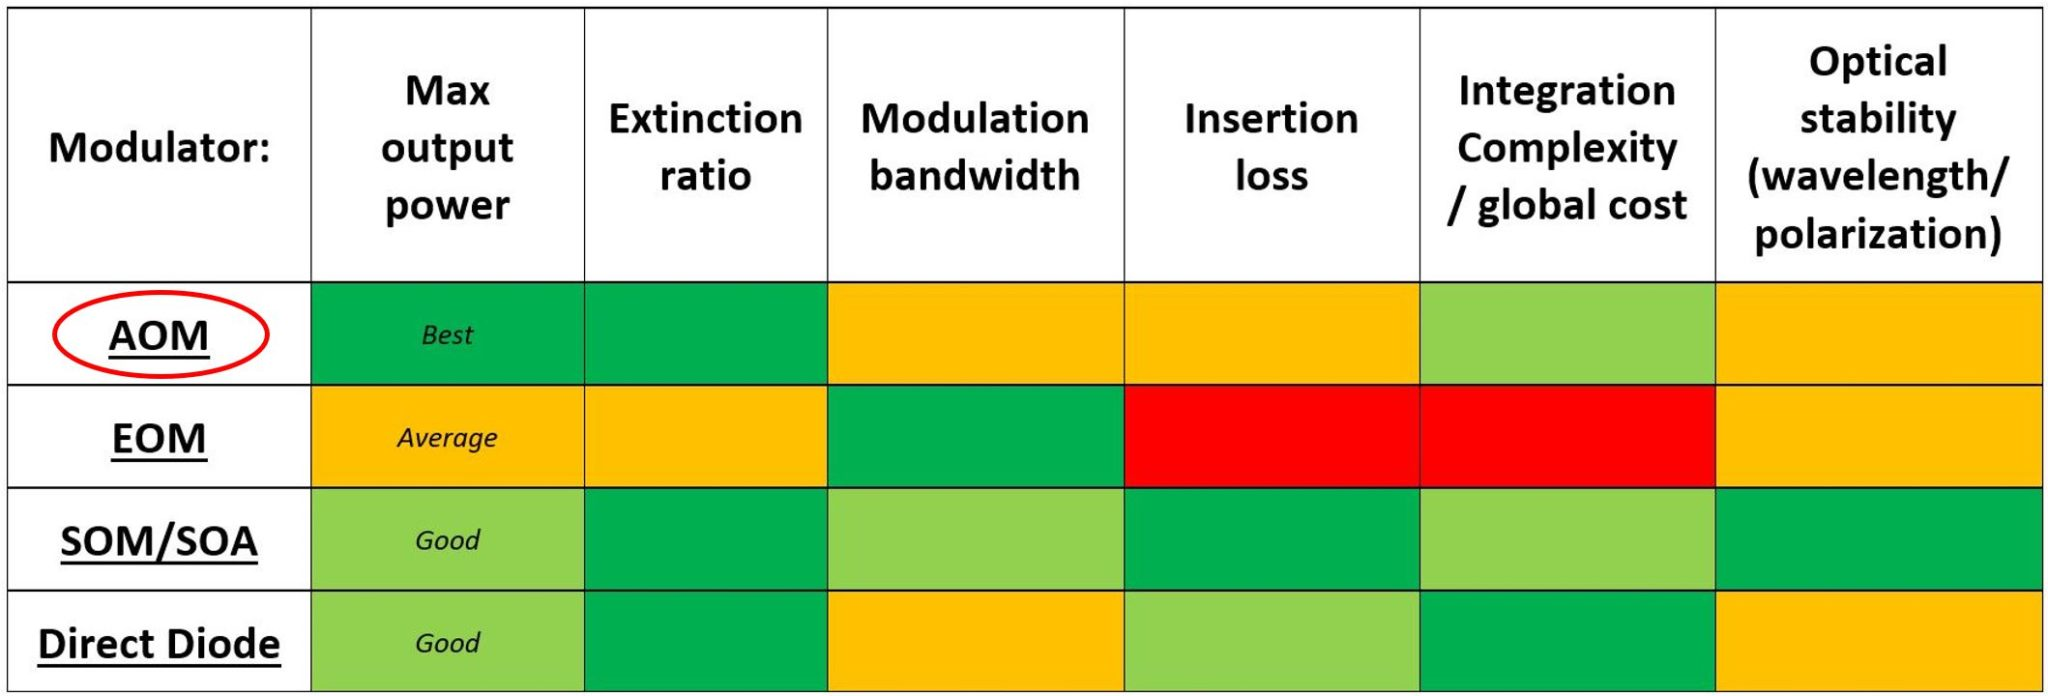 fiber modulator comparison - AOM